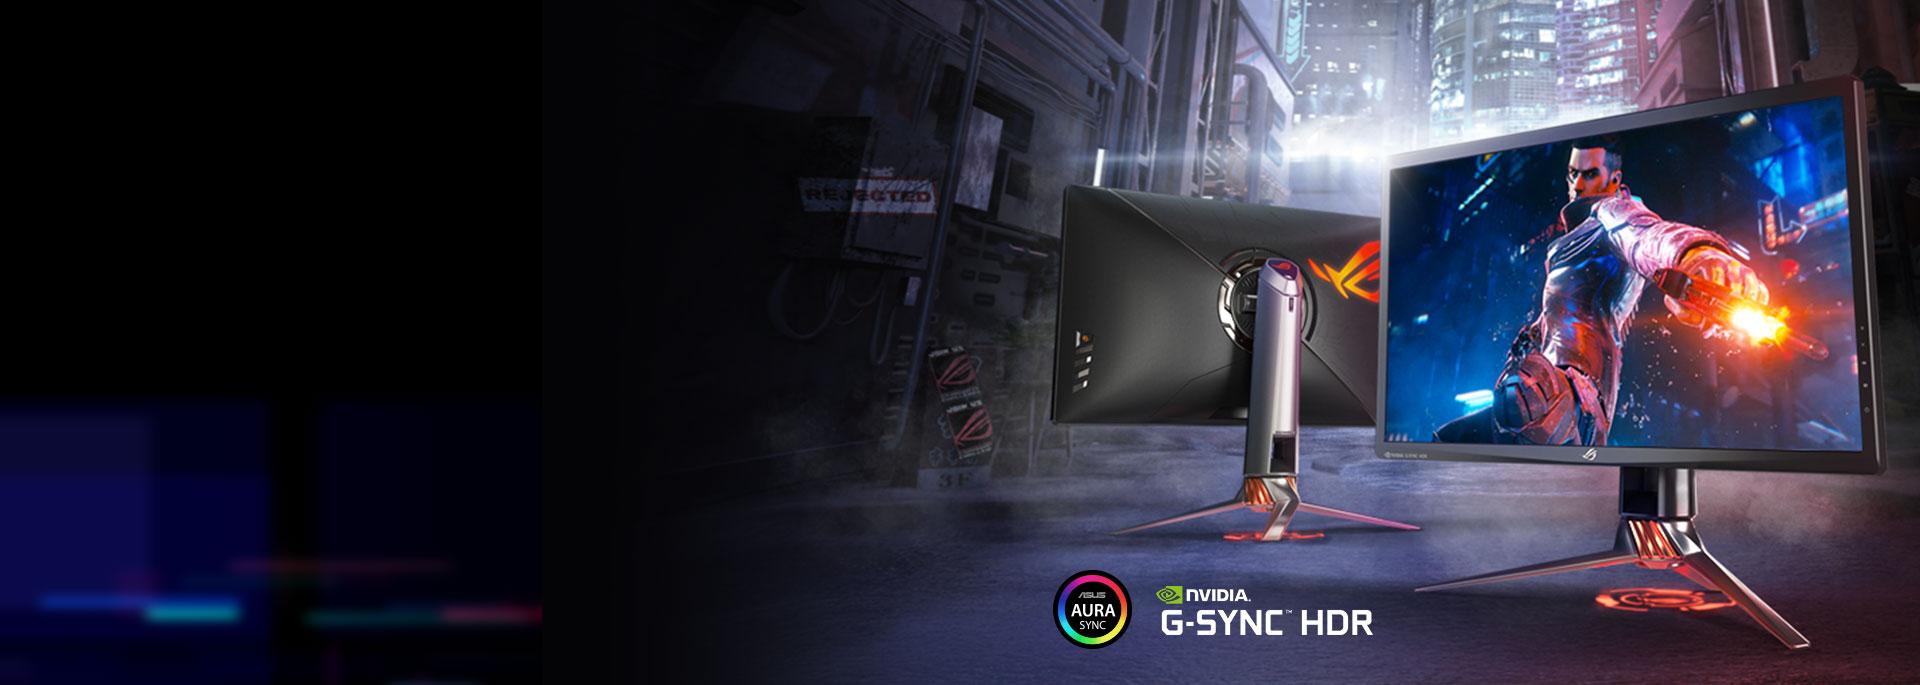 ASUS ROG Strix GeForce GTX 1660 Ti OC Edition Graphics Card